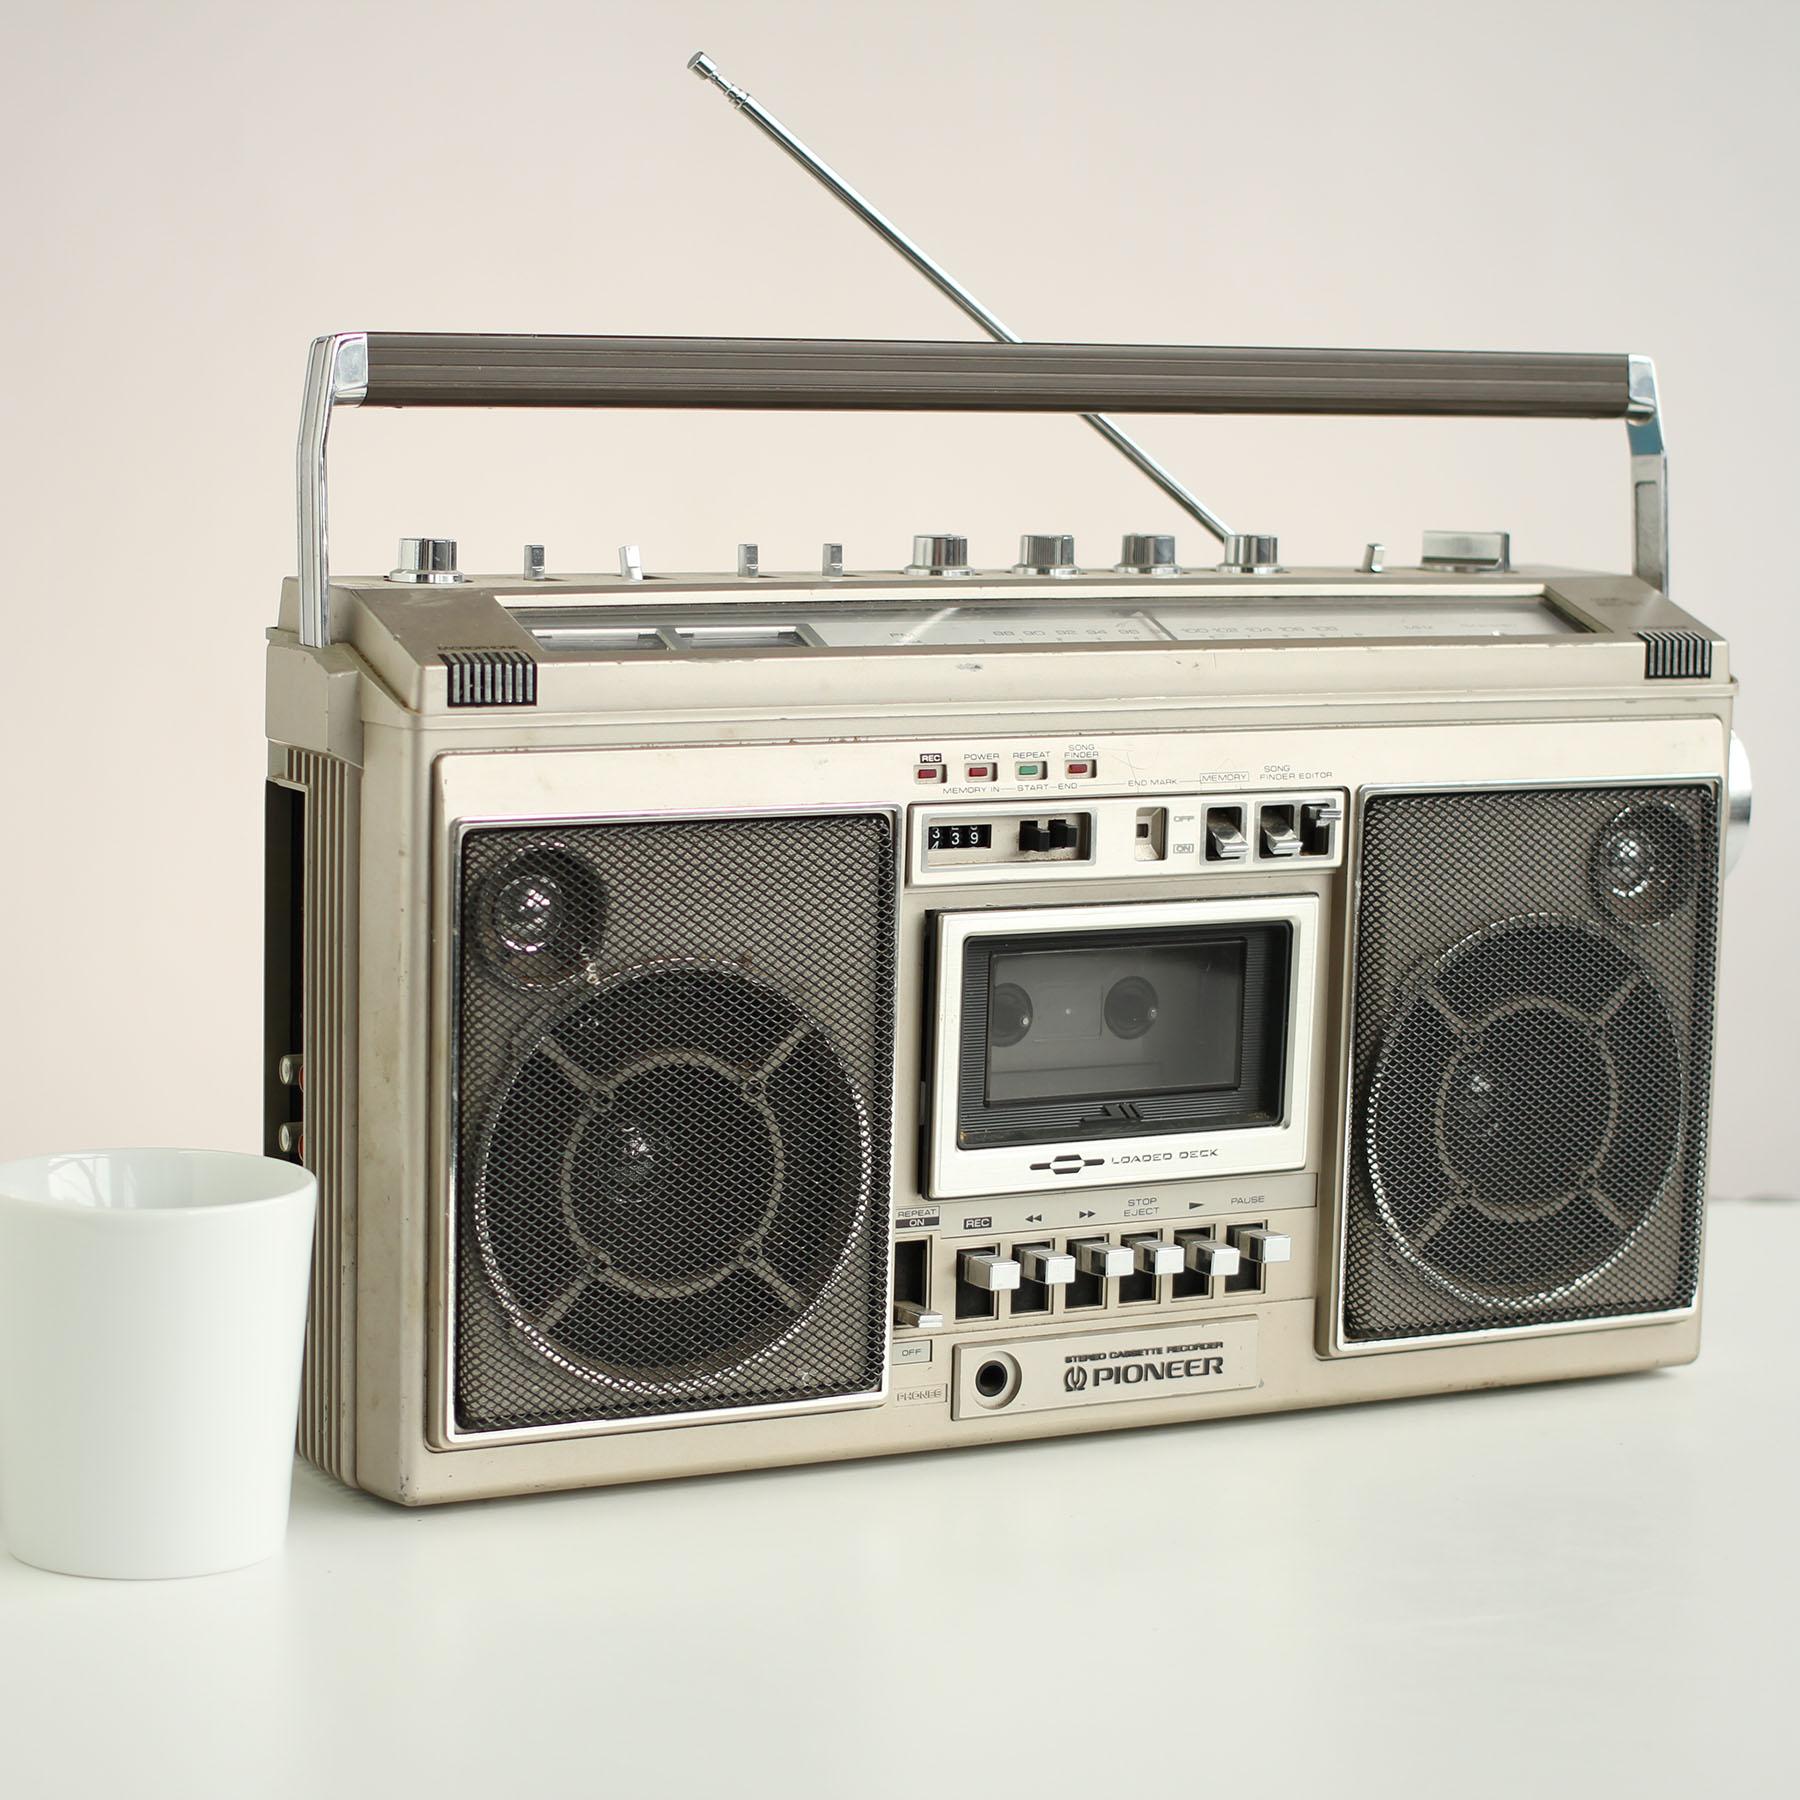 Vintage Electronics and Typewriters.